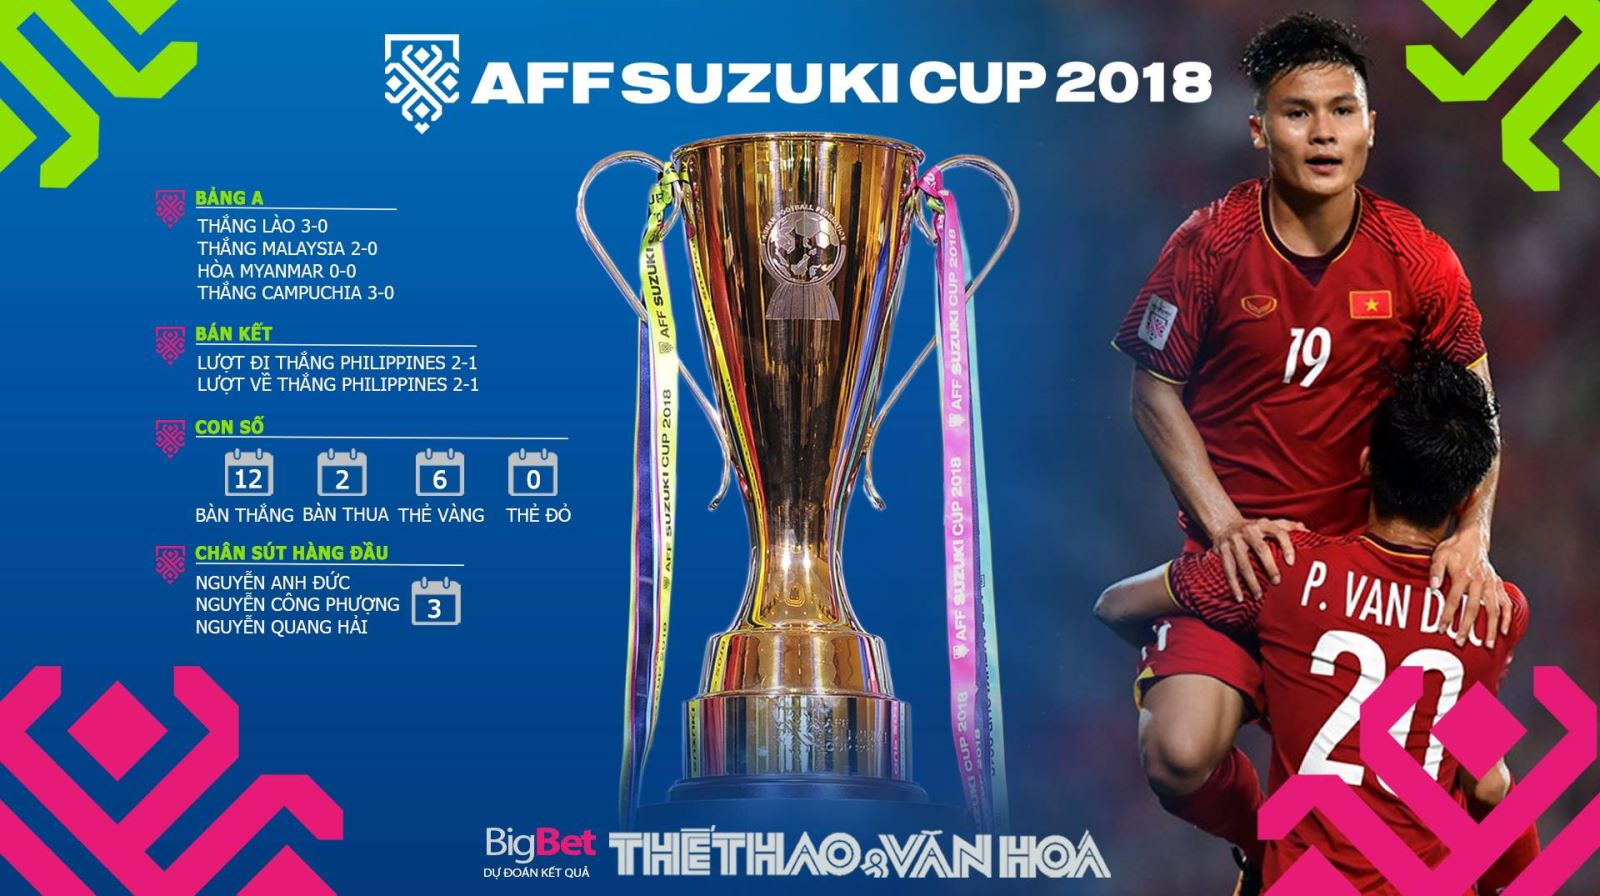 VTV6, truc tiep bong da, VTC3, VTV5, vtv6 truc tiep bong da, trực tiếp bóng đá vtv6, bong da, xem vtv6, Malaysia, Việt Nam, Malaysia Việt Nam, lịch thi đấu AFF Cup 2018.